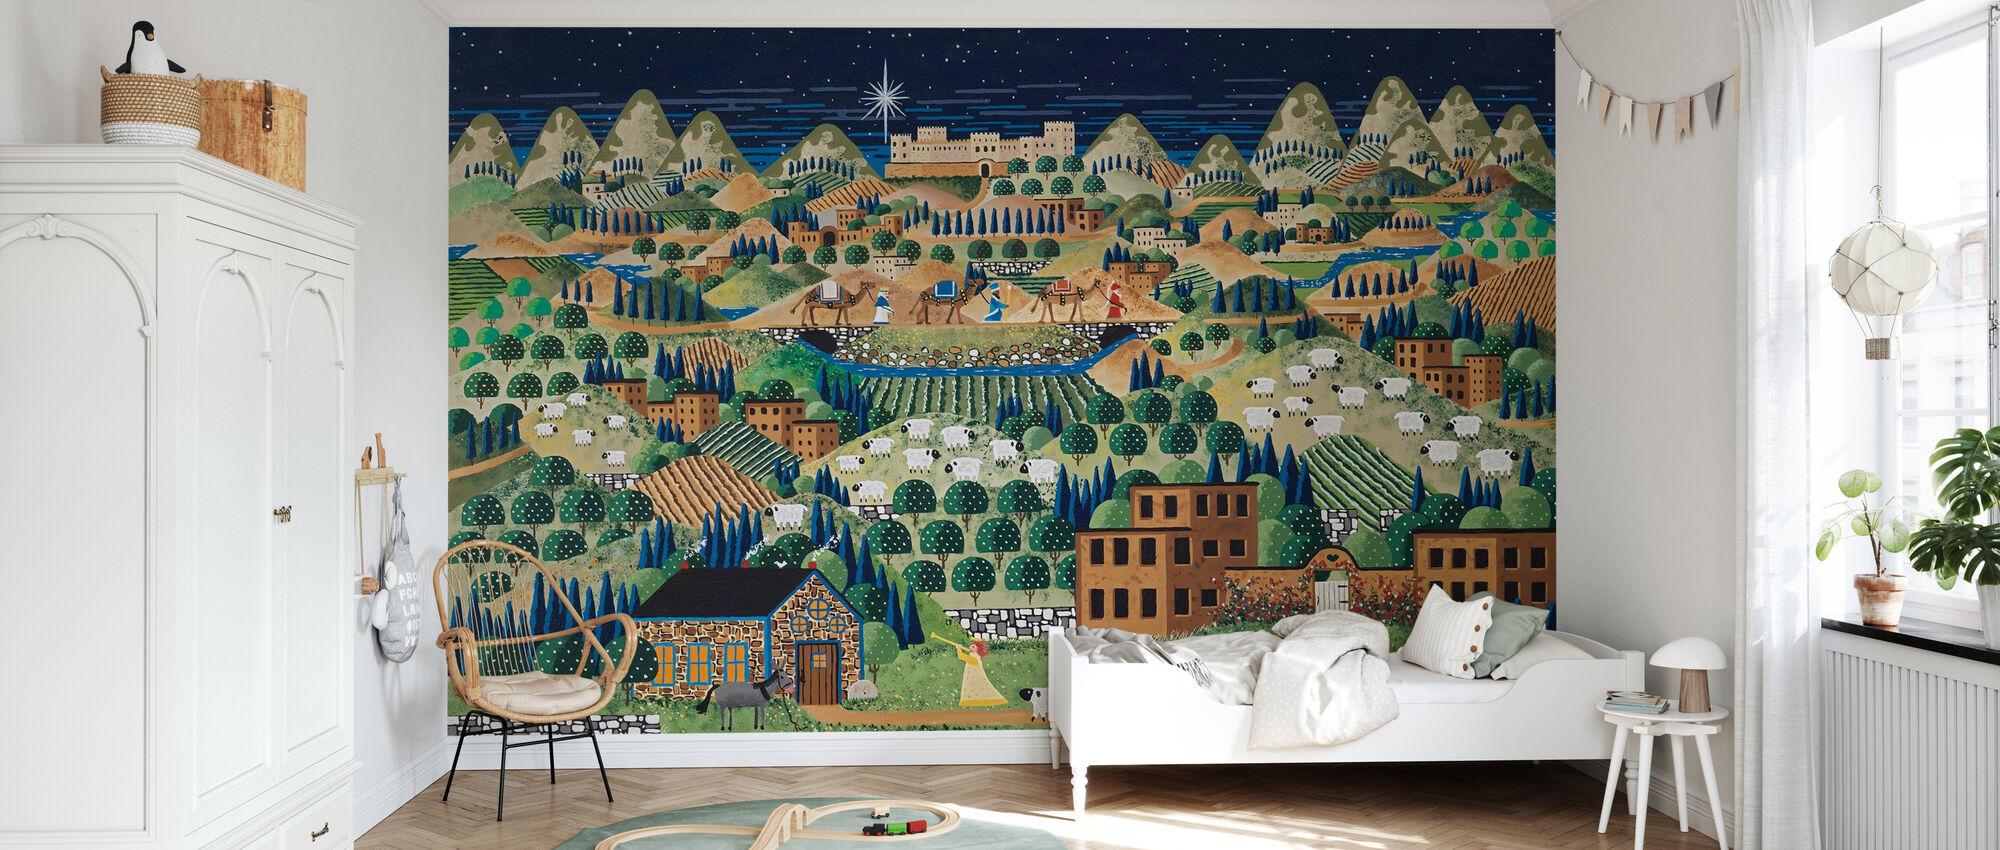 The Journey - Wallpaper - Kids Room